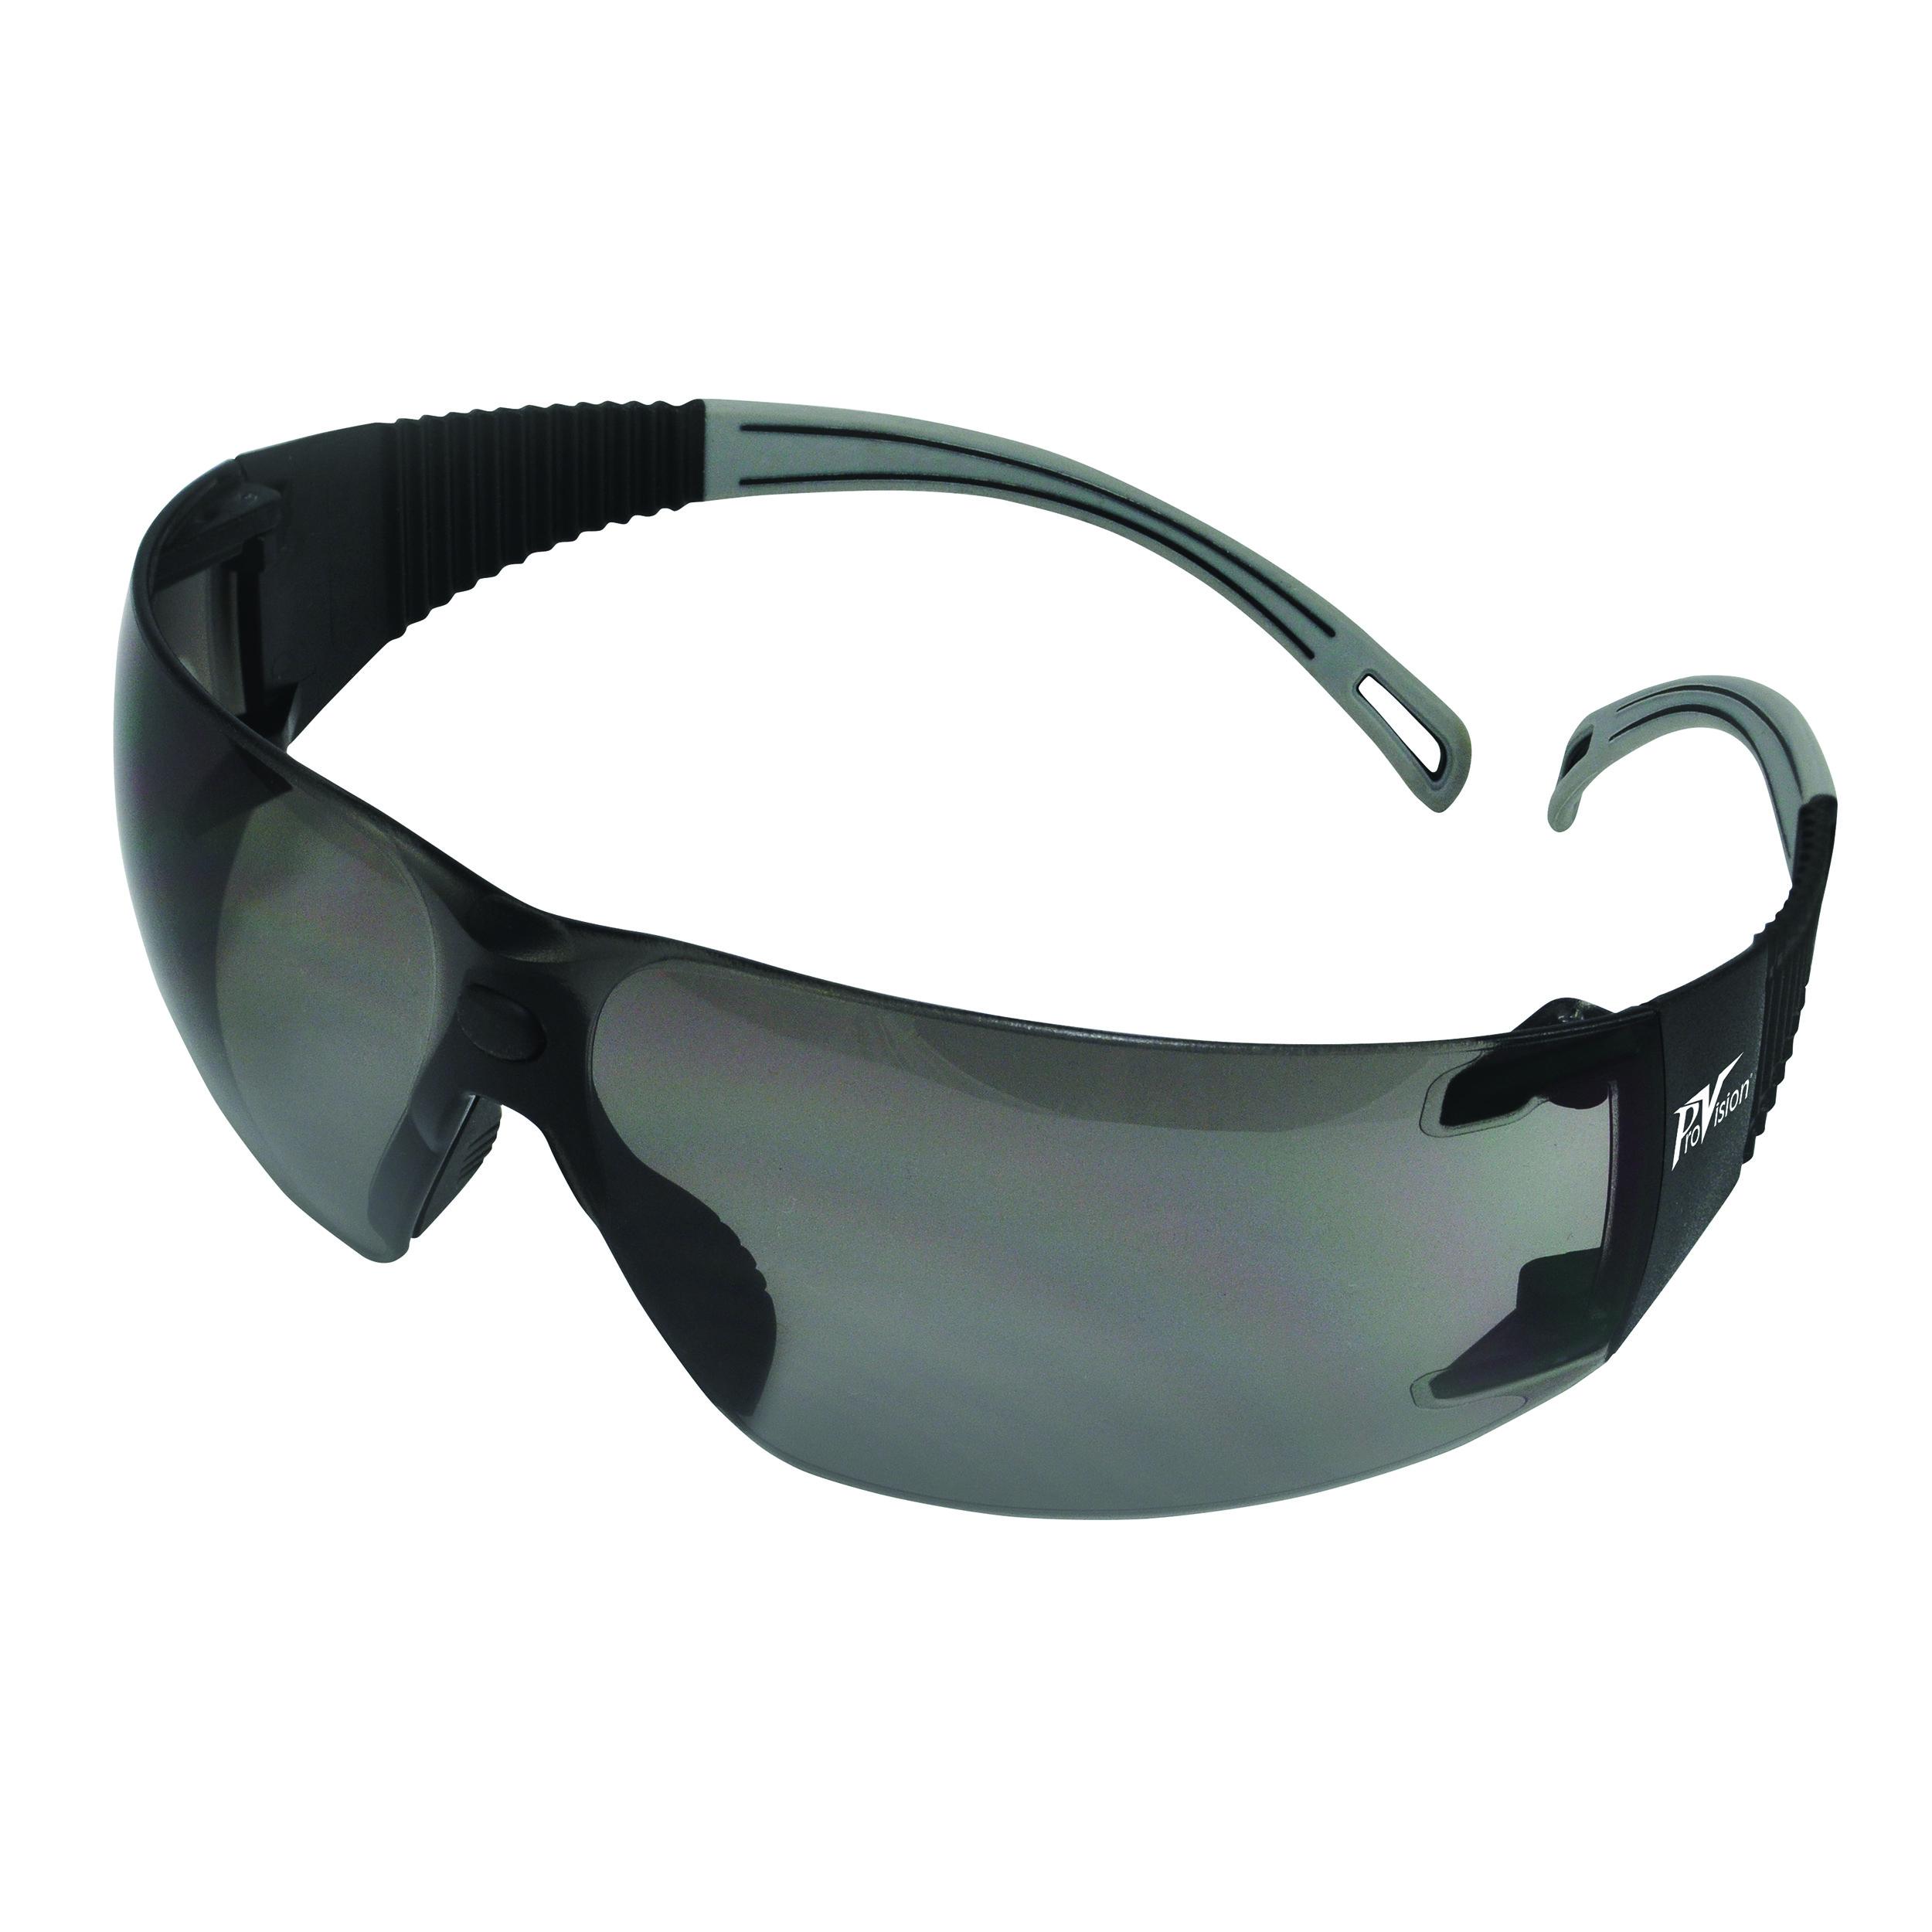 9200123 ProVision Flexiwrap Eyewear Black Frame, Grey Tips, Grey Lens, 3609GG